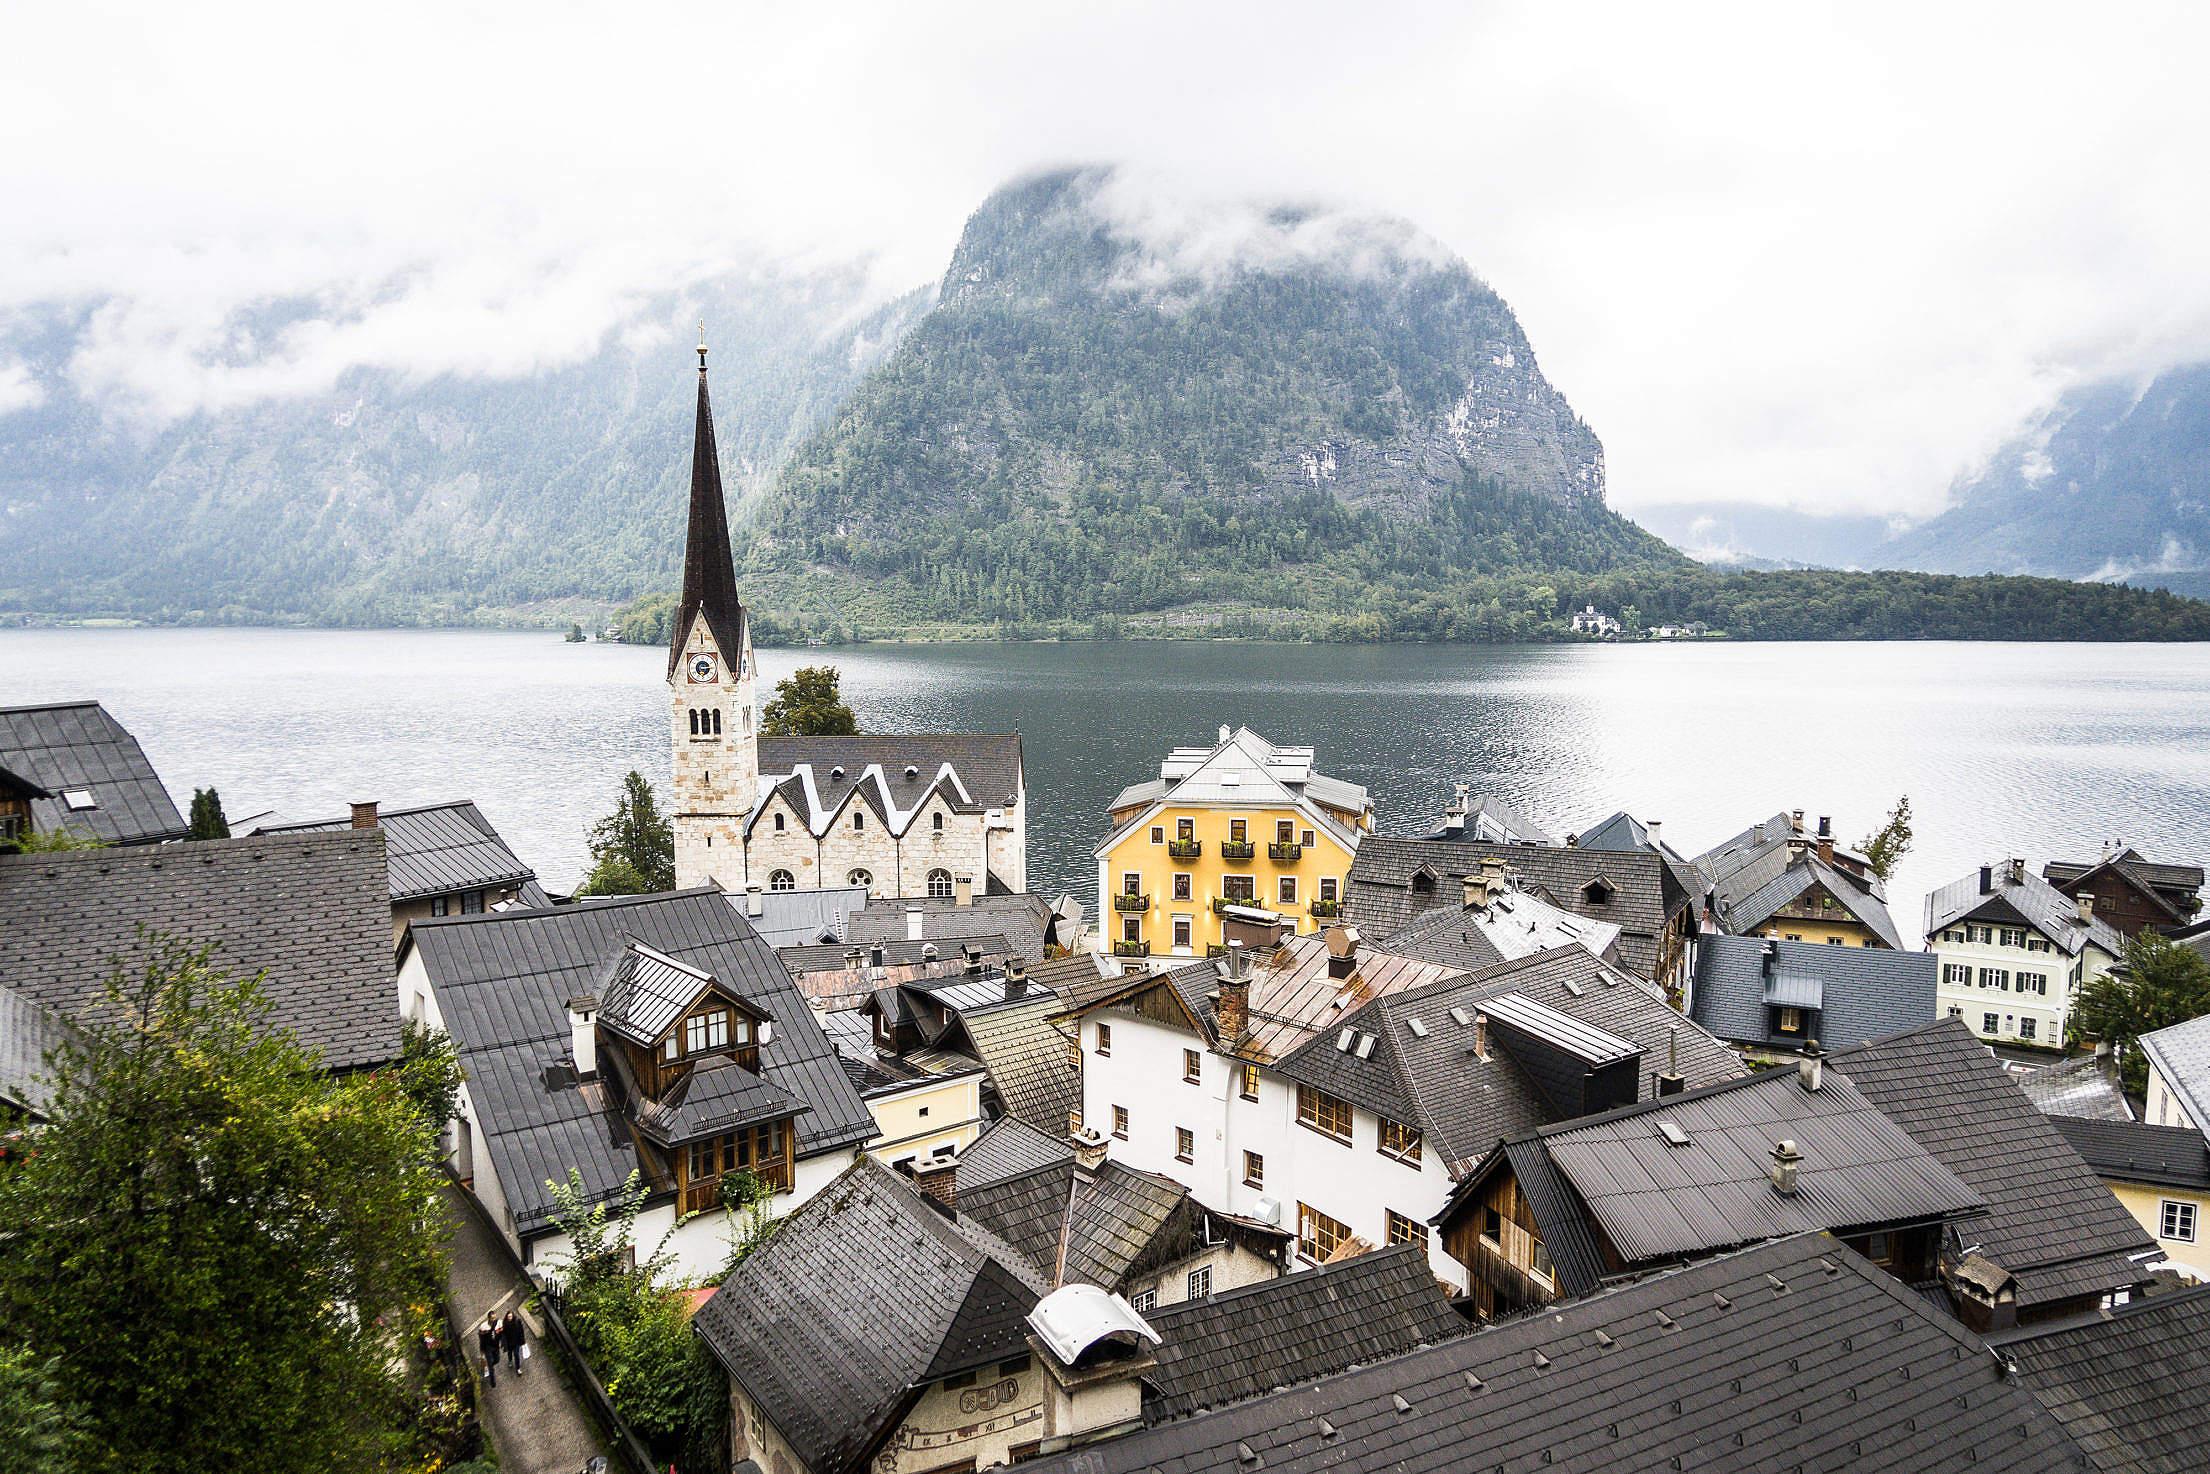 Panorama Over the Little Town Hallstatt in Austria Free Stock Photo